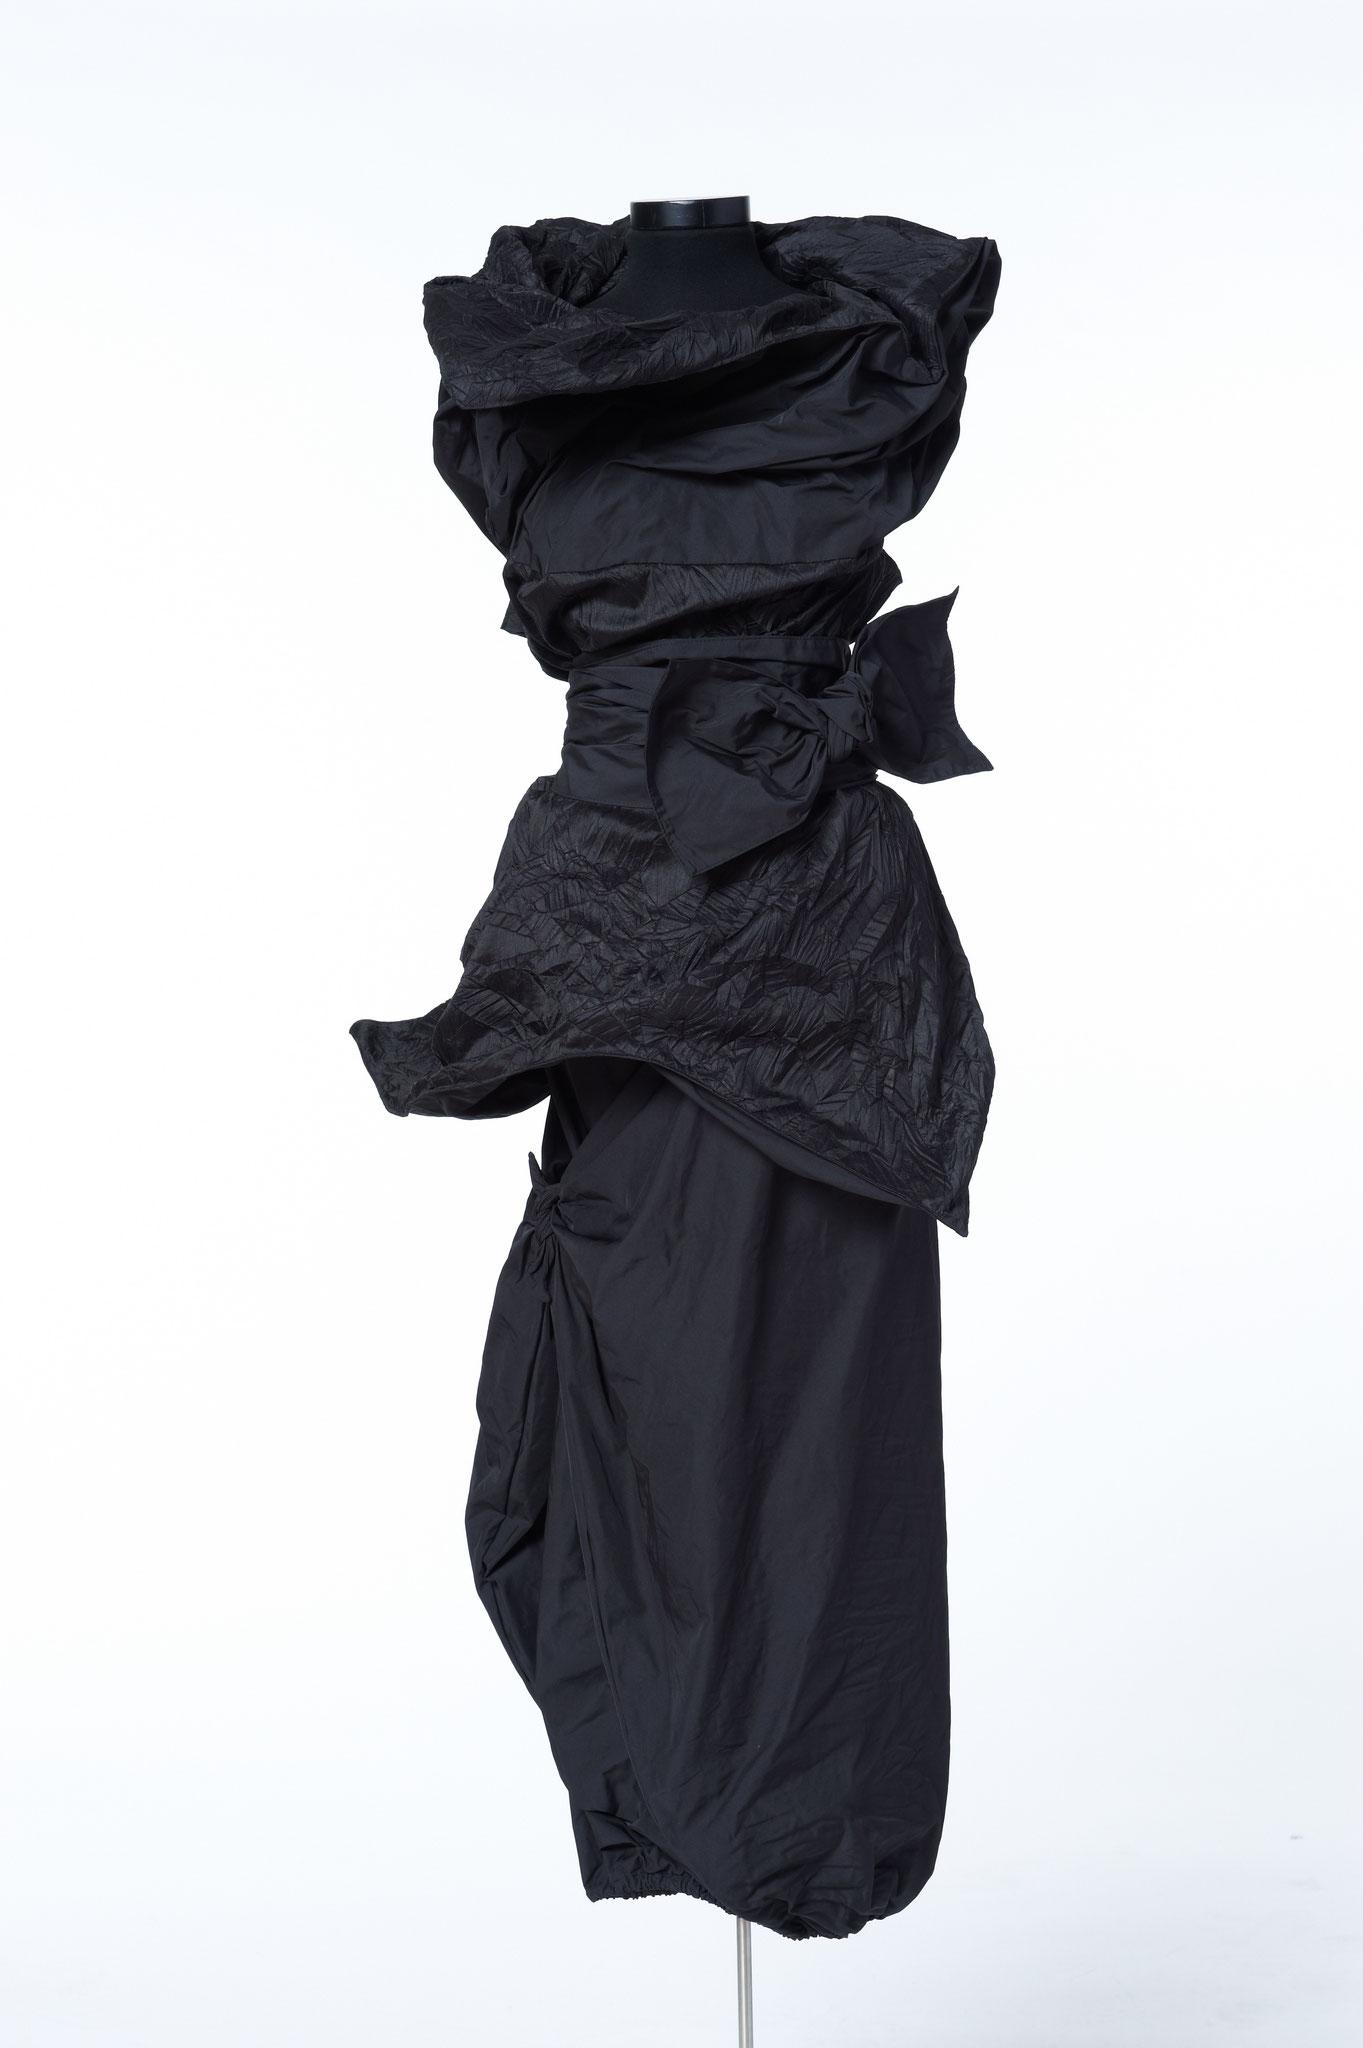 3-teiliges Outfit: Zipfelrock, Schärpe Oberteil. Material: Seide/ Mikrofaser